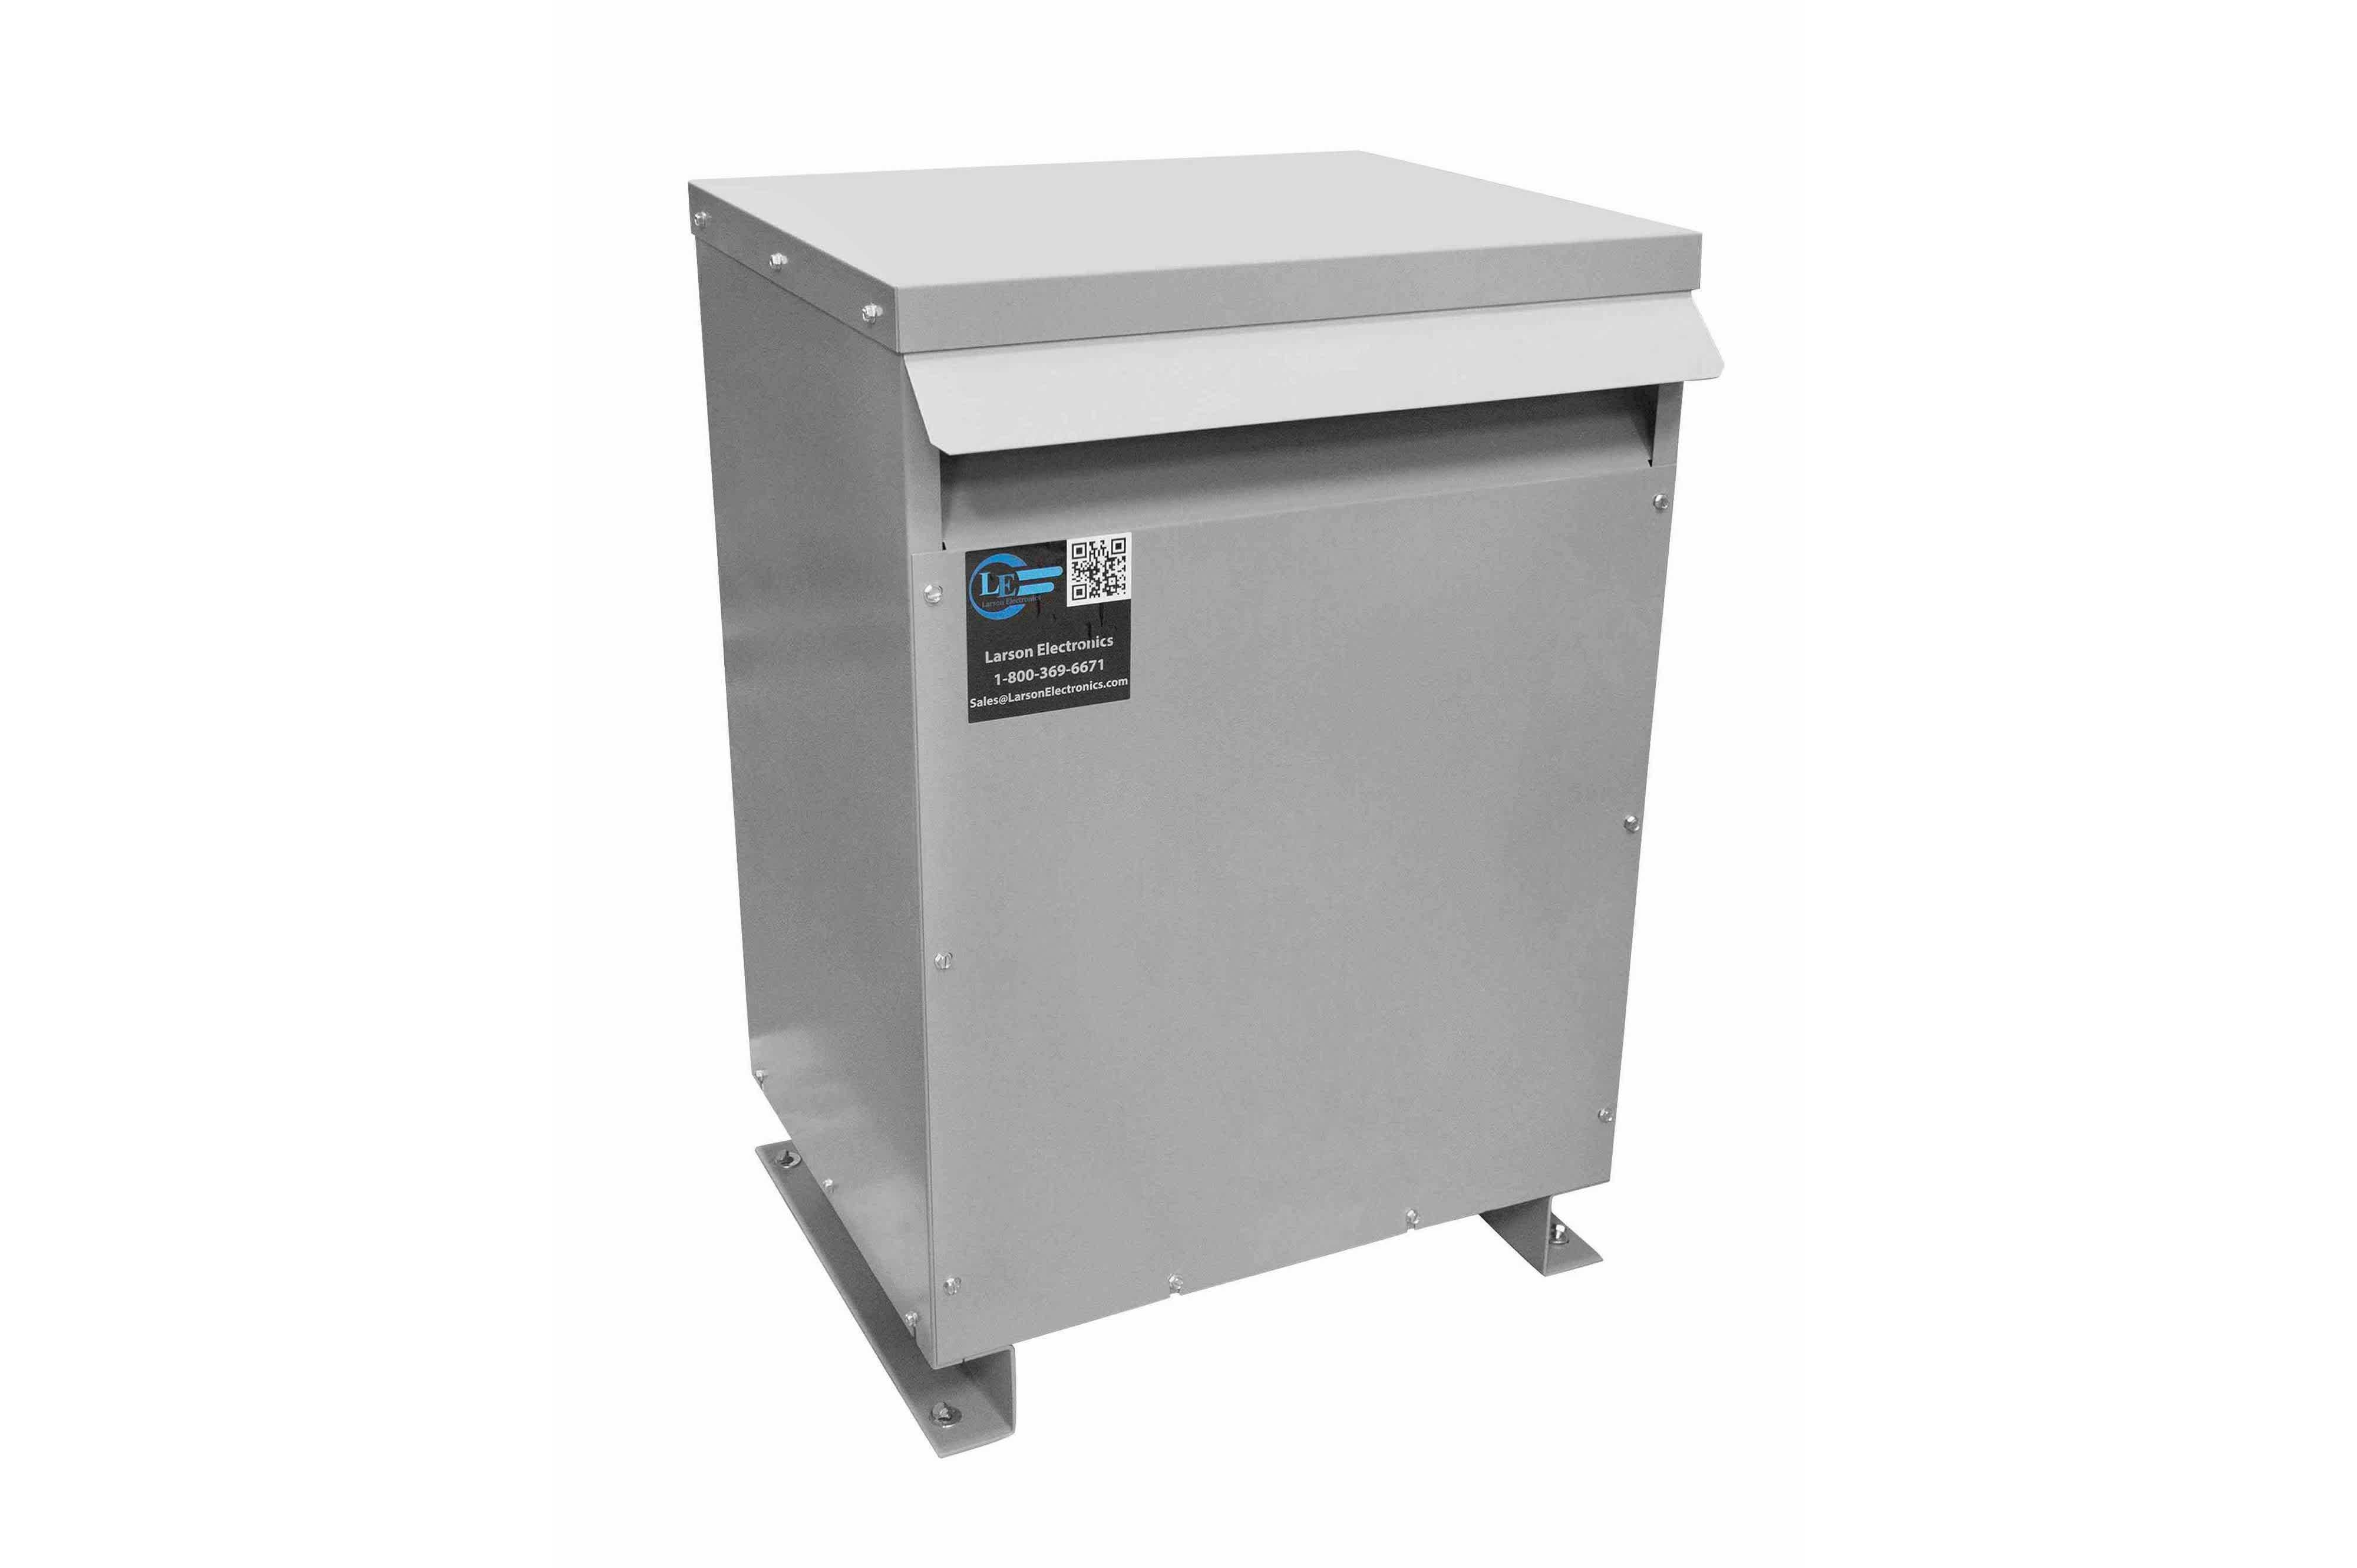 225 kVA 3PH Isolation Transformer, 575V Wye Primary, 480Y/277 Wye-N Secondary, N3R, Ventilated, 60 Hz